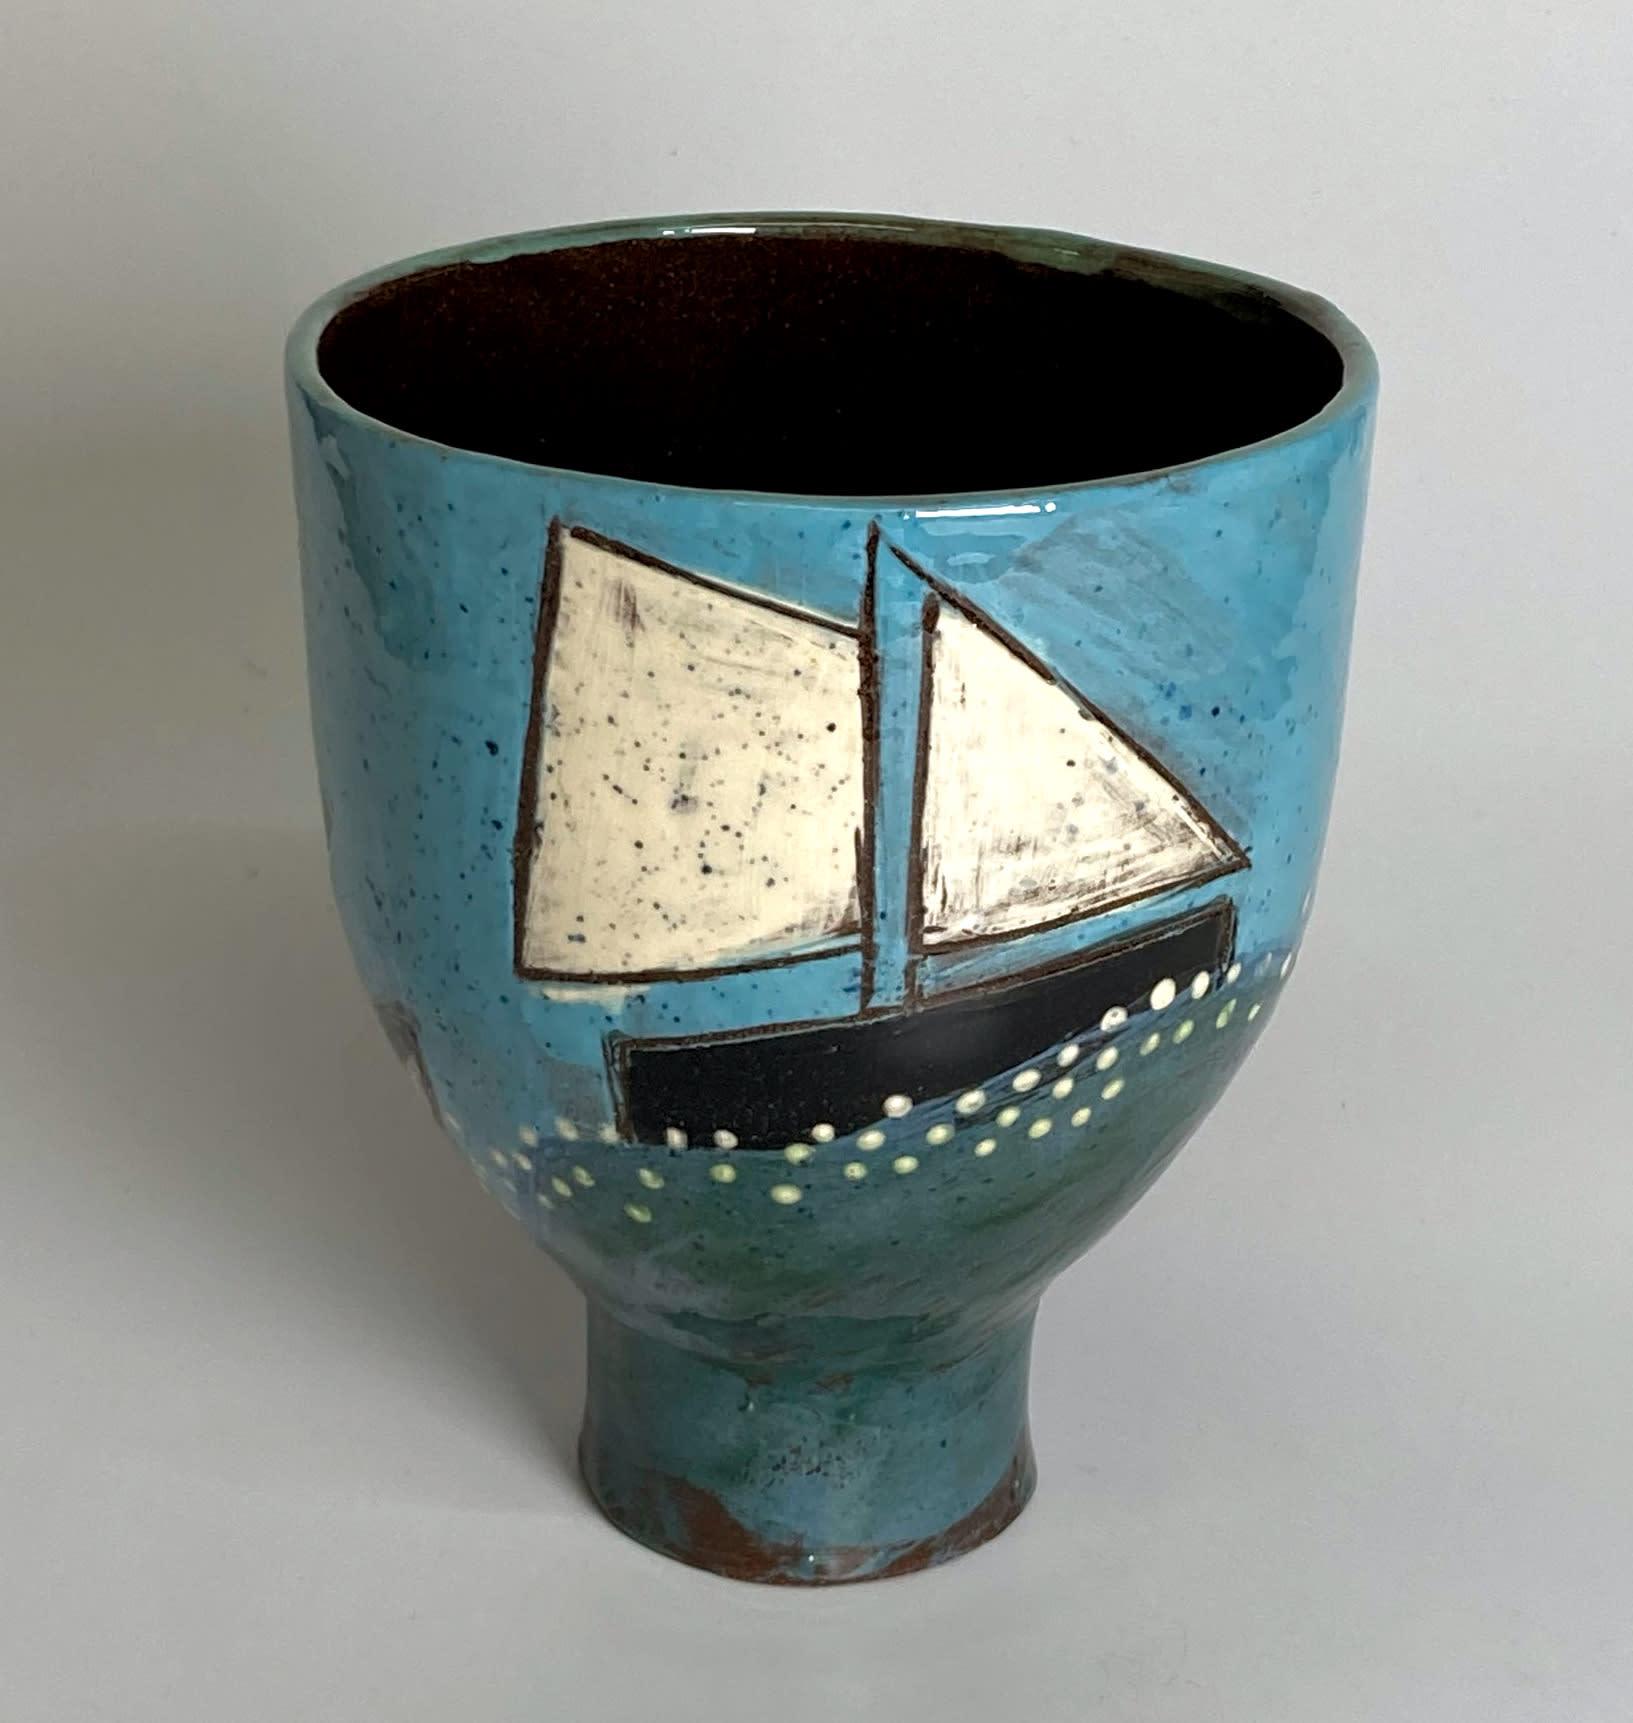 "<span class=""link fancybox-details-link""><a href=""/artists/428-anne-barrell/works/7696-anne-barrell-sailing-into-harbour-2021/"">View Detail Page</a></span><div class=""artist""><strong>Anne Barrell</strong></div> <div class=""title""><em>Sailing into Harbour</em>, 2021</div> <div class=""medium"">handmade, hand-painted ceramic </div> <div class=""dimensions"">h. 14 x w. 13 cm </div><div class=""price"">£150.00</div><div class=""copyright_line"">Own Art: £15 x 10 Months, 0% APR</div>"